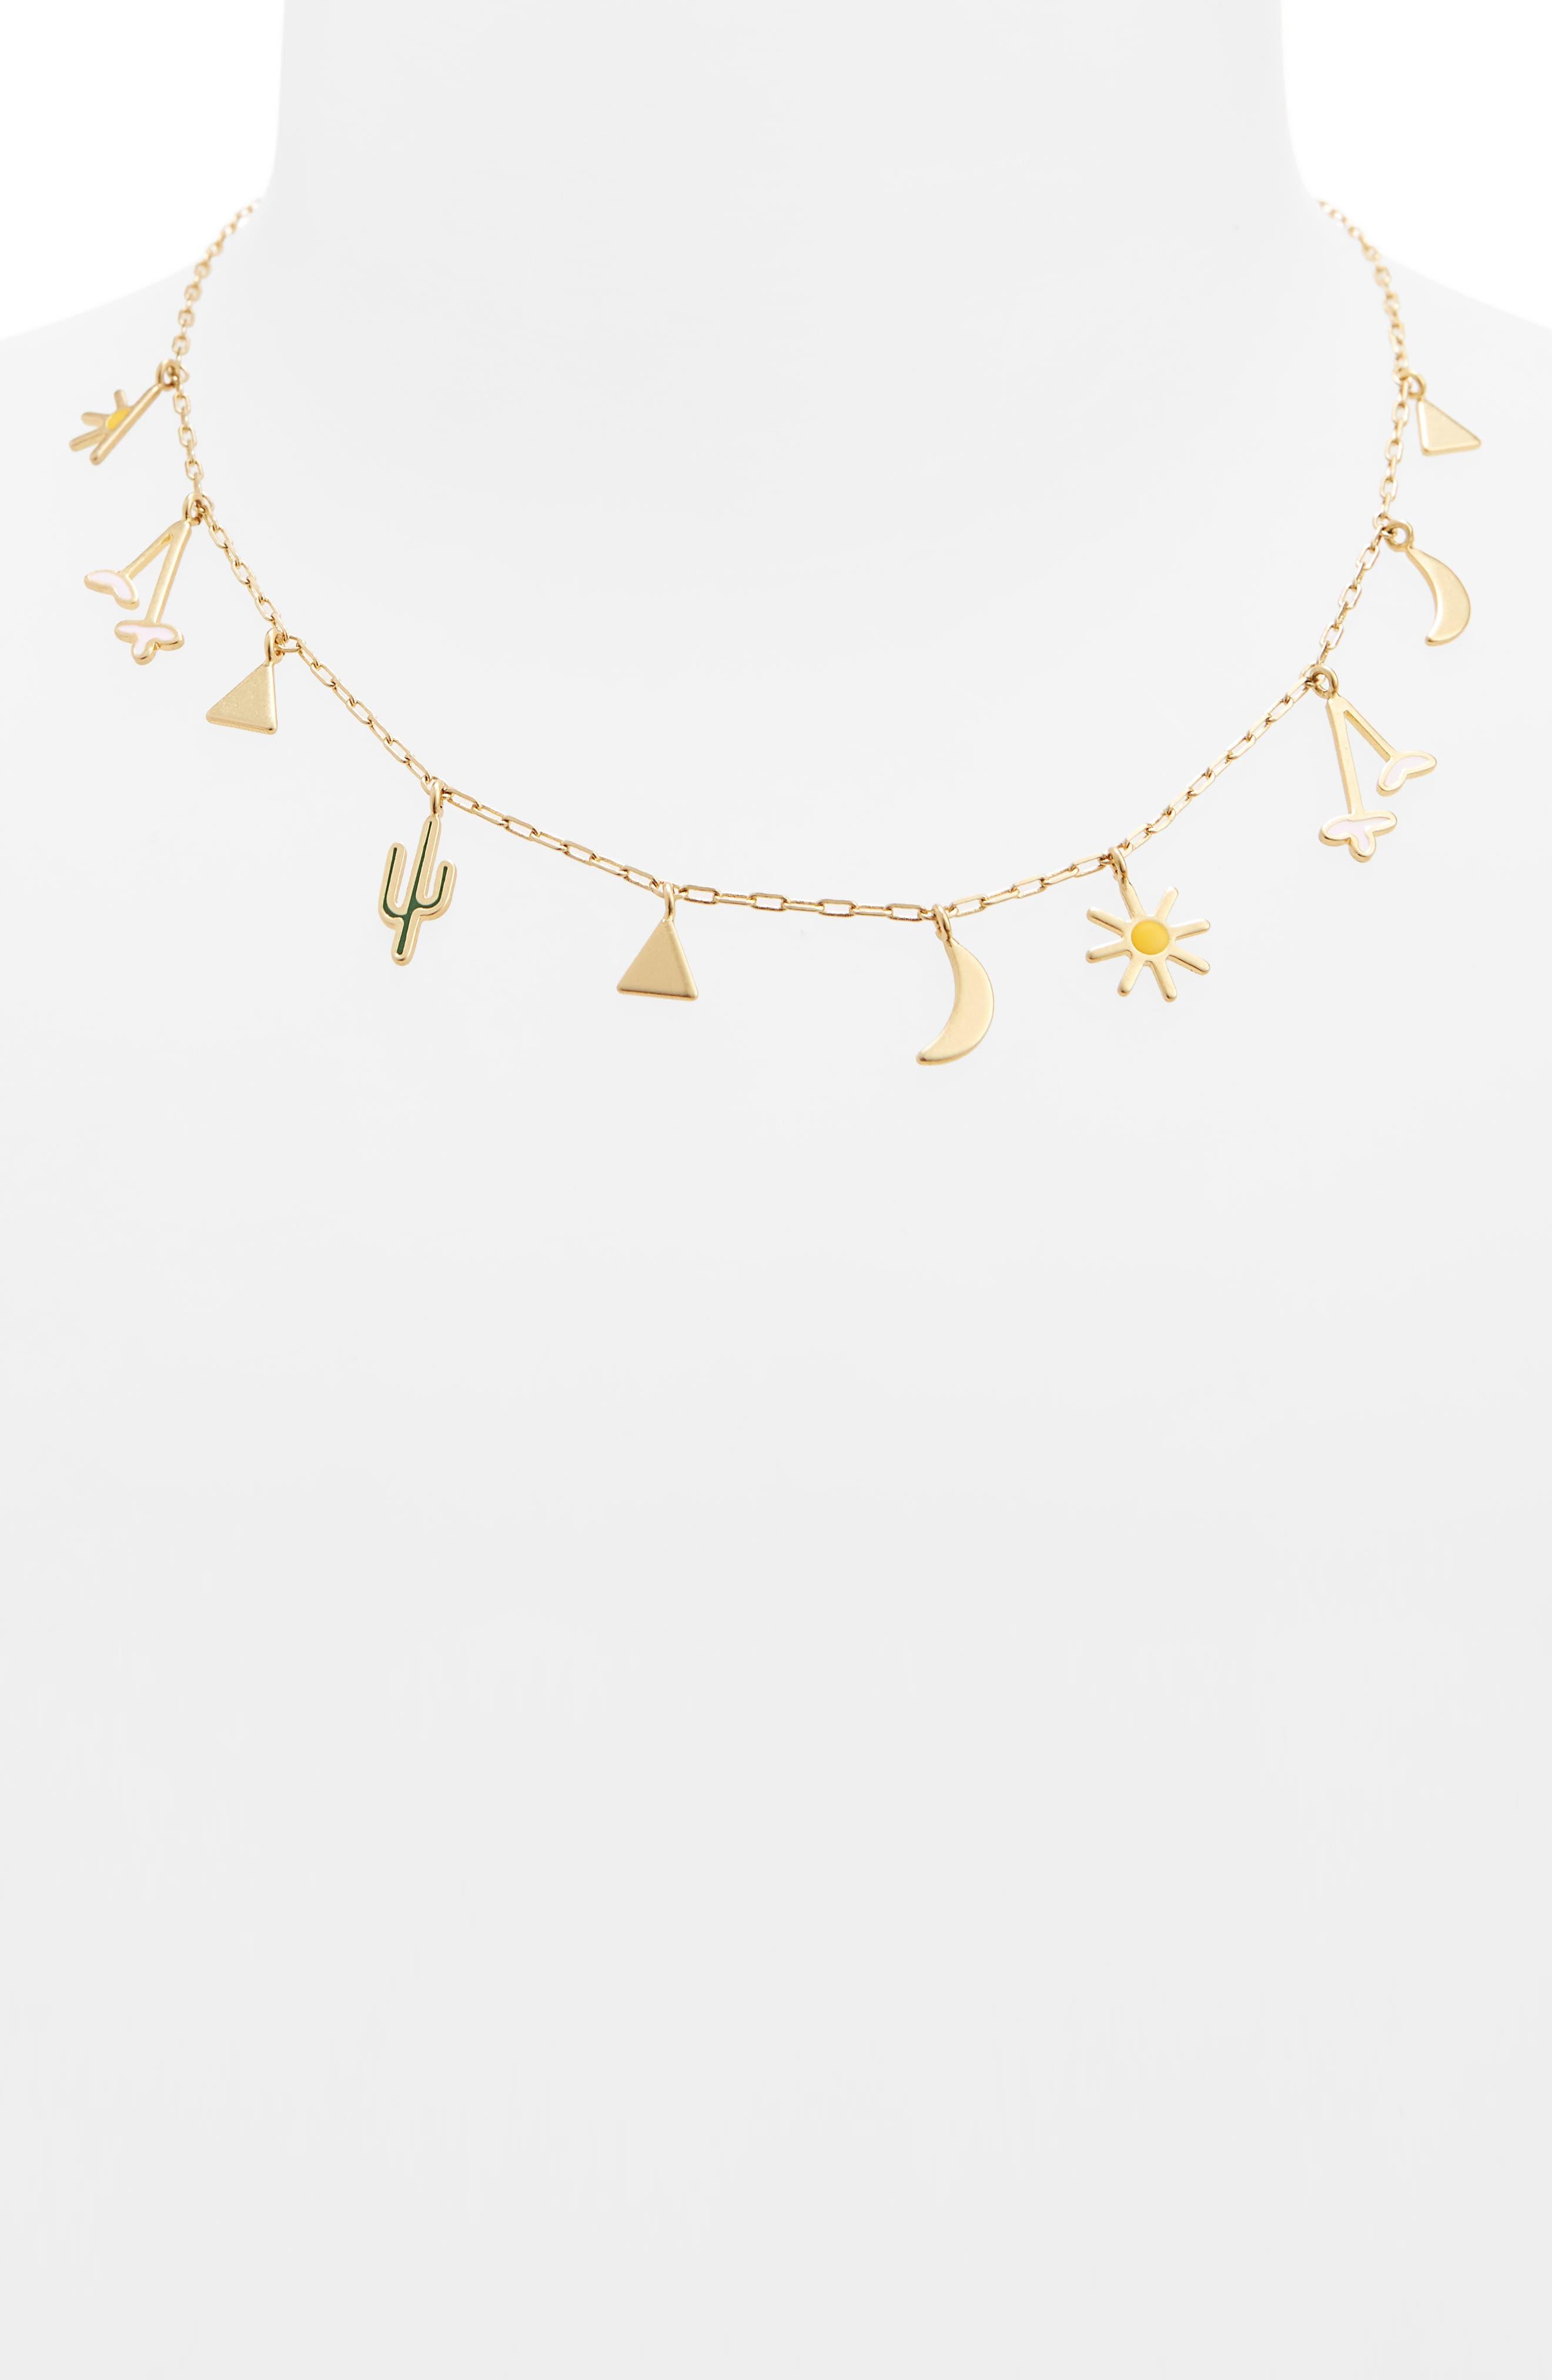 Primal Charm Necklace,                             Alternate thumbnail 2, color,                             Vintage Gold